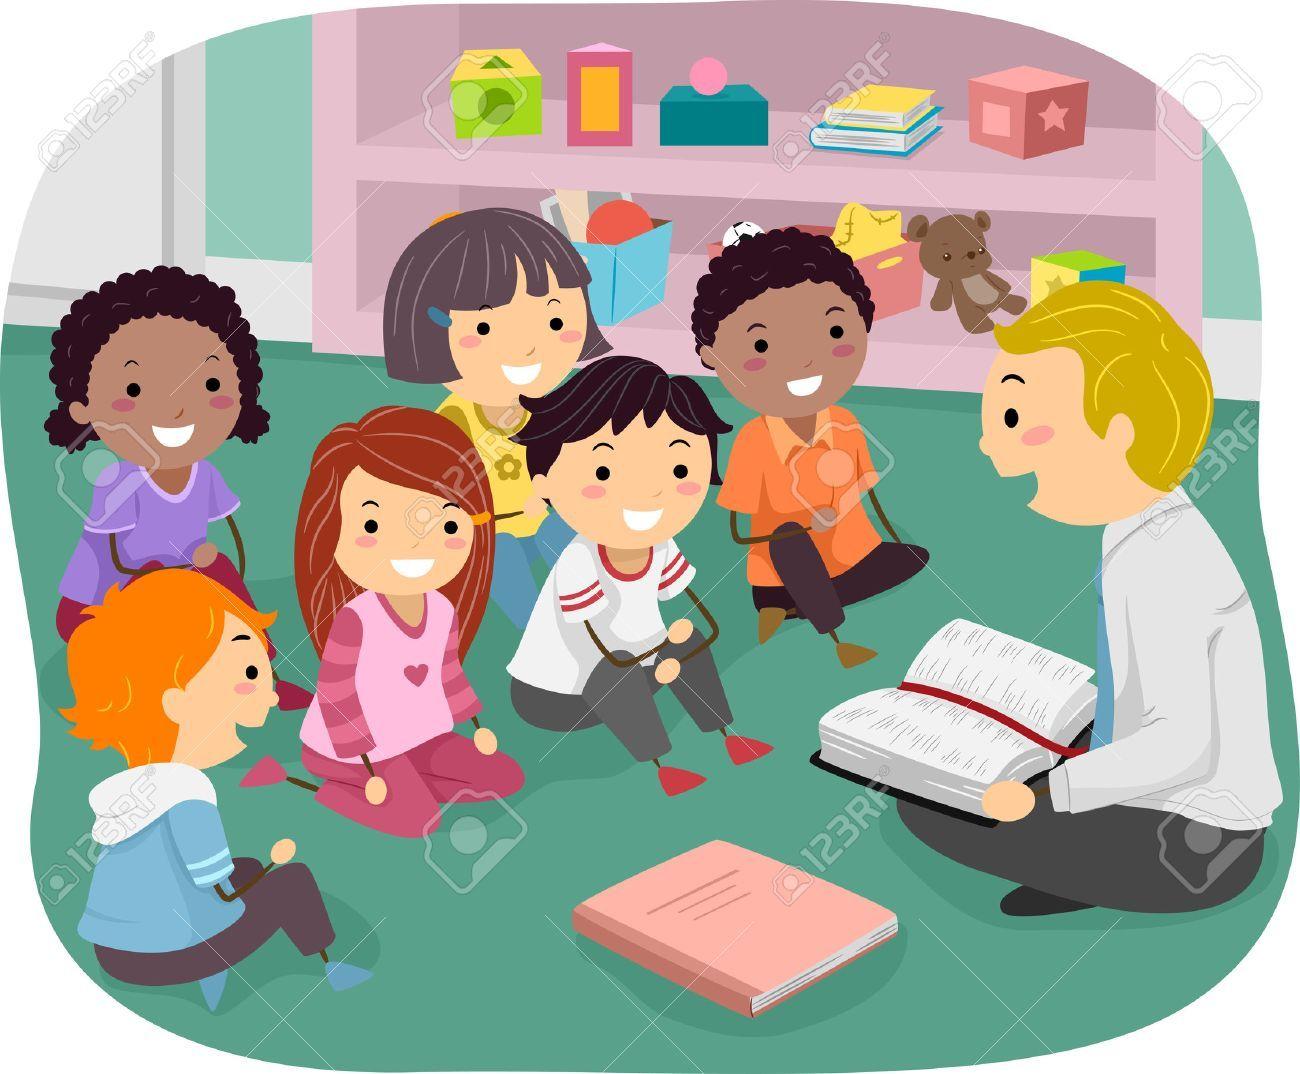 Sunday school children clipart 7 » Clipart Portal.